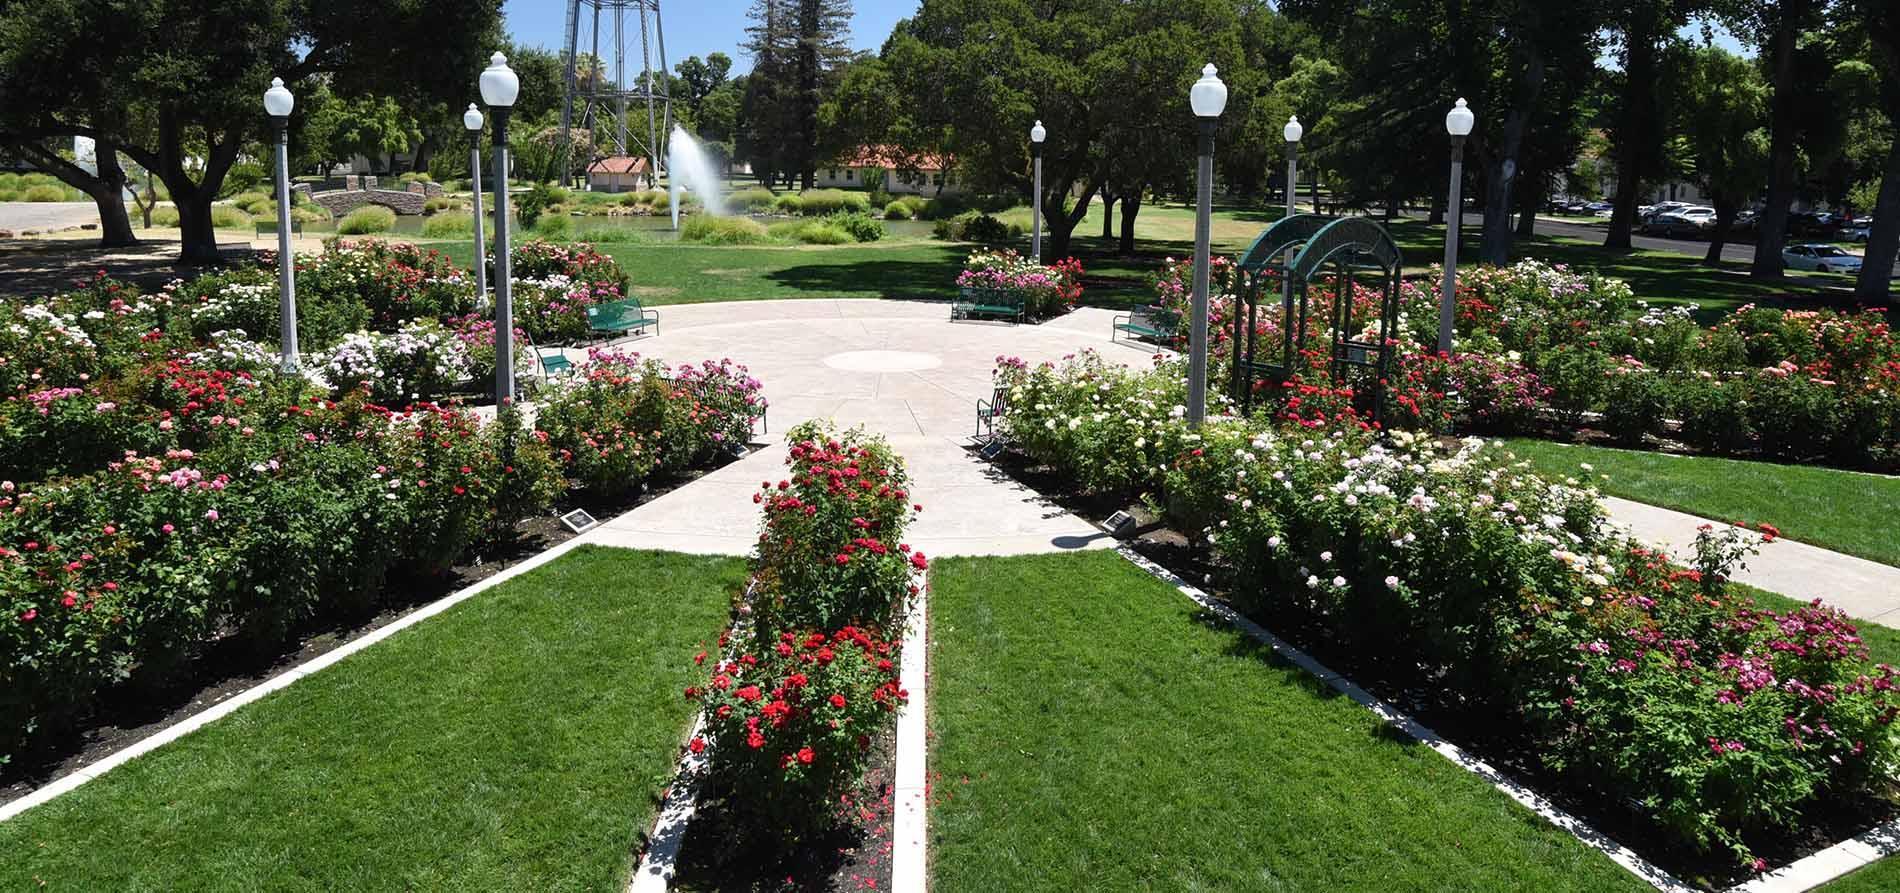 Sister Garden: University Park World Peace Rose Garden